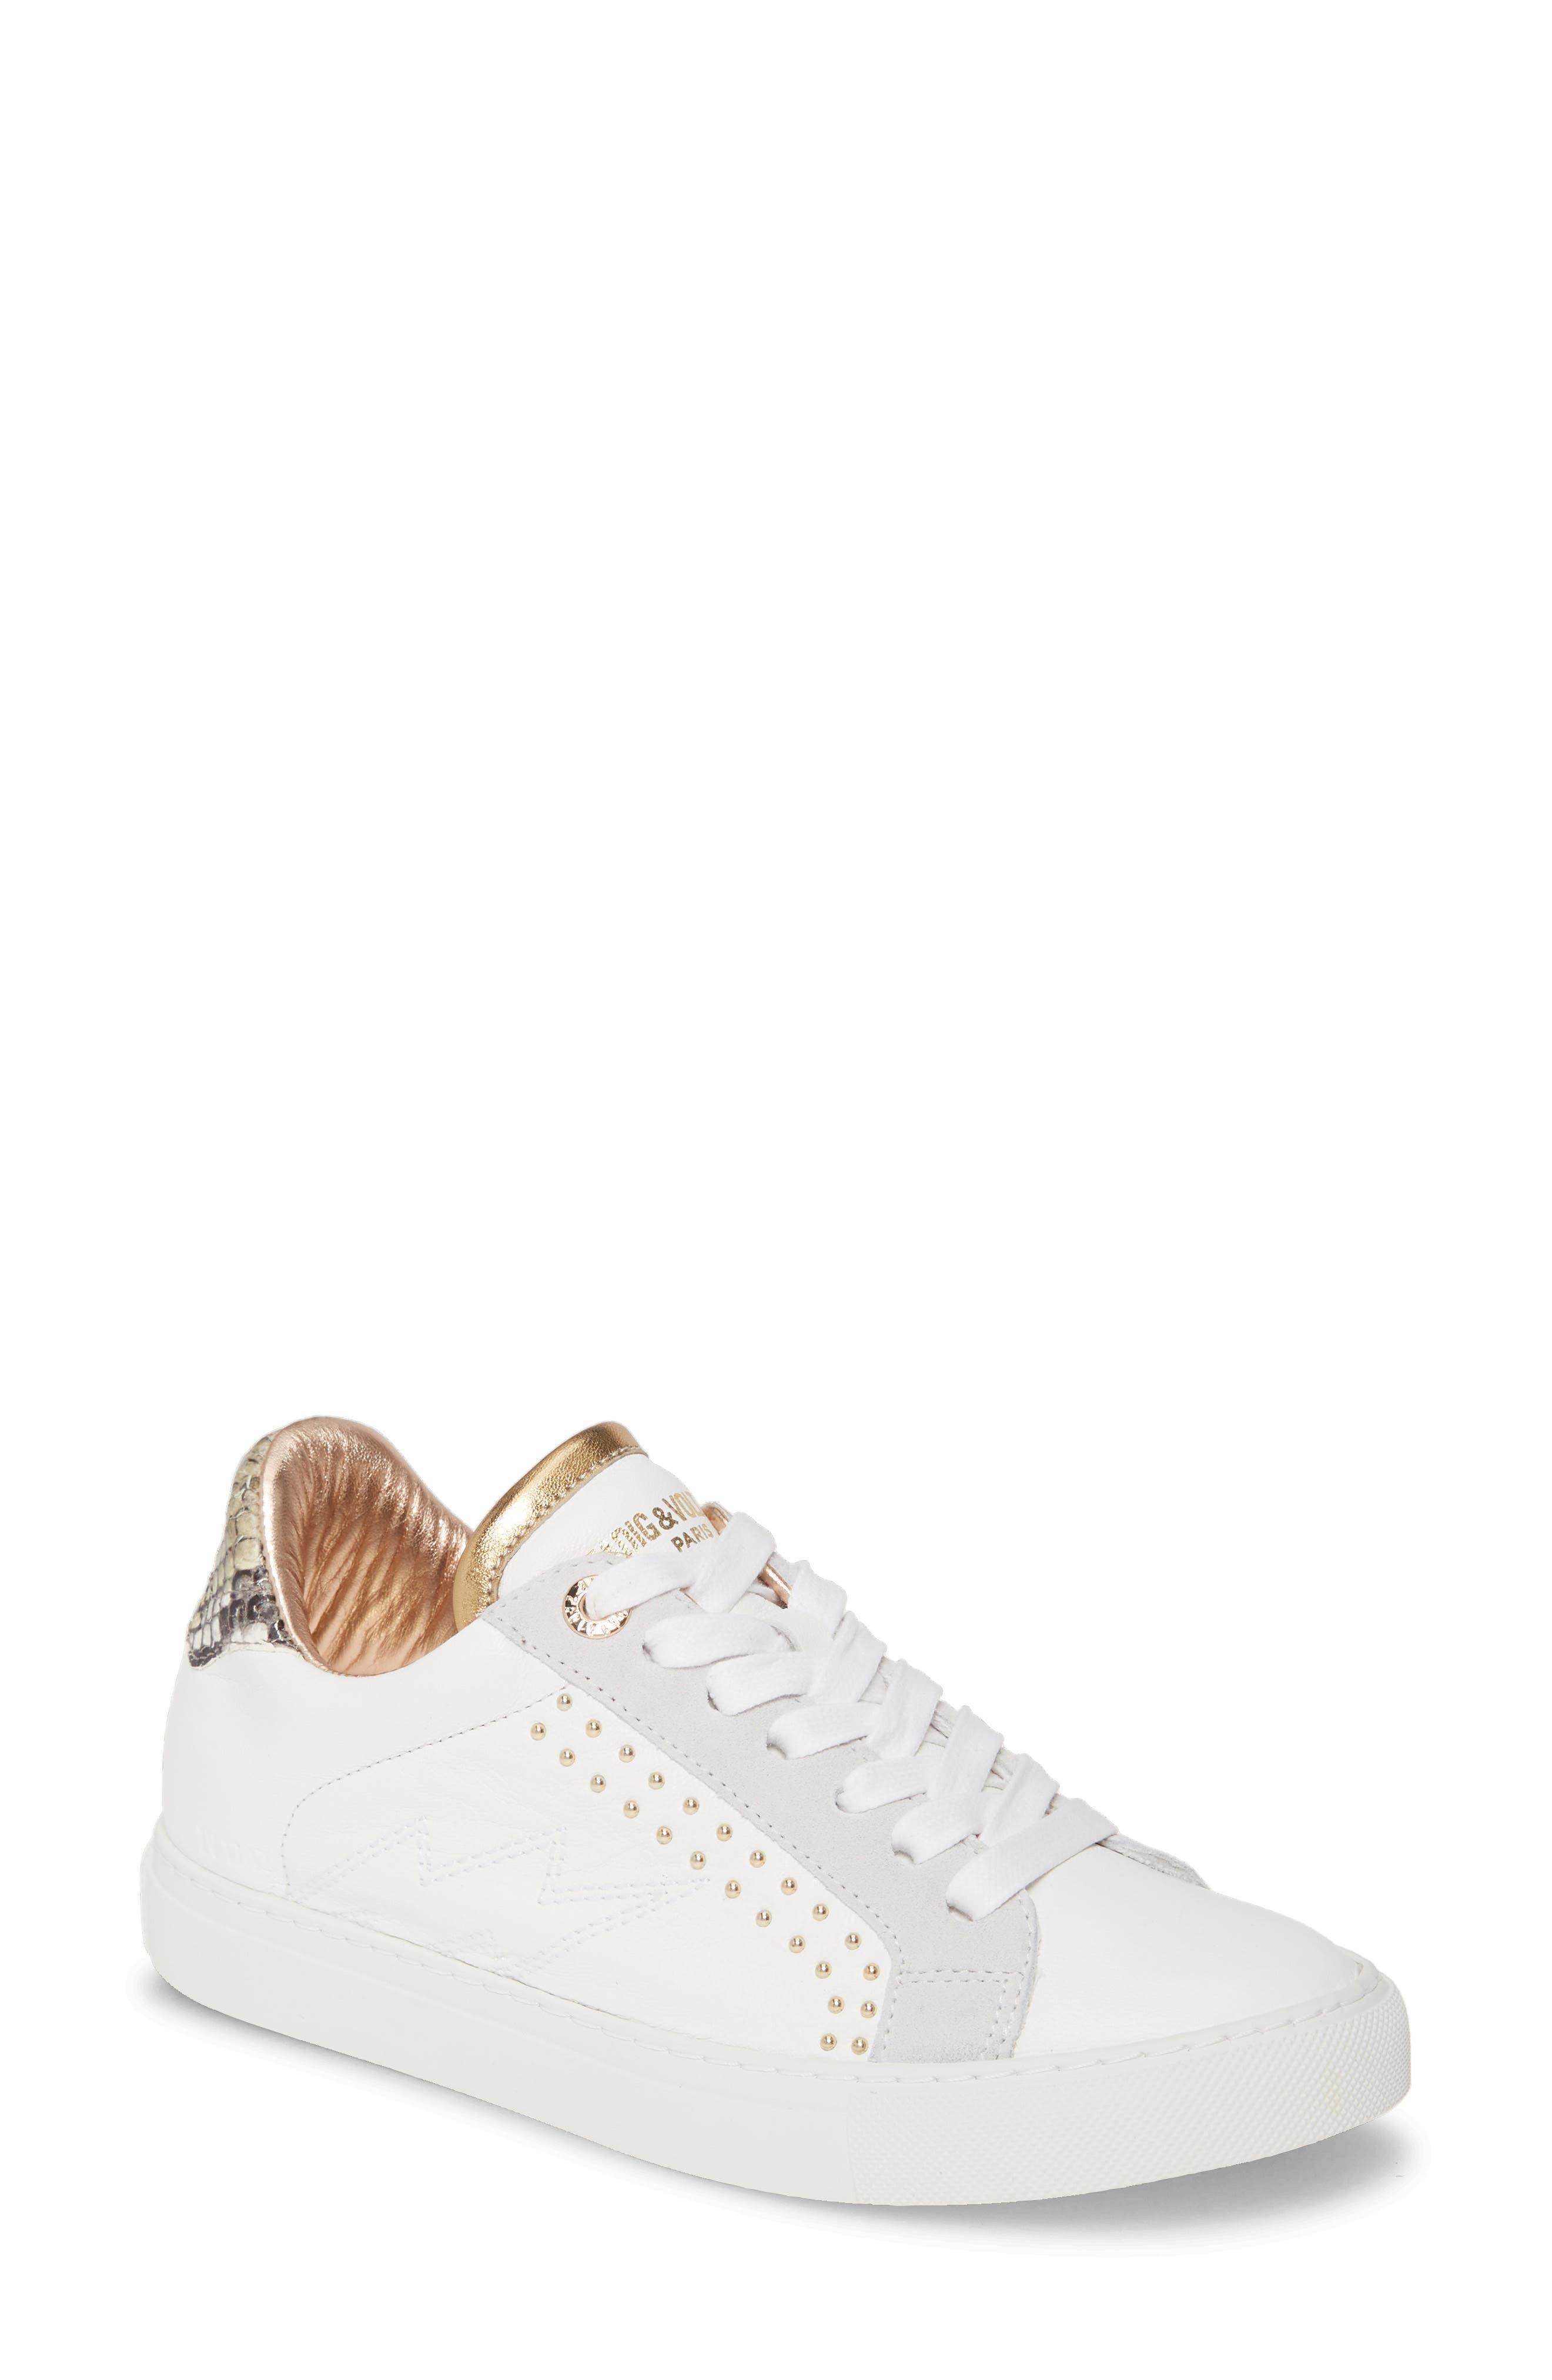 Zadig \u0026 Voltaire Sneakers \u0026 Athletic